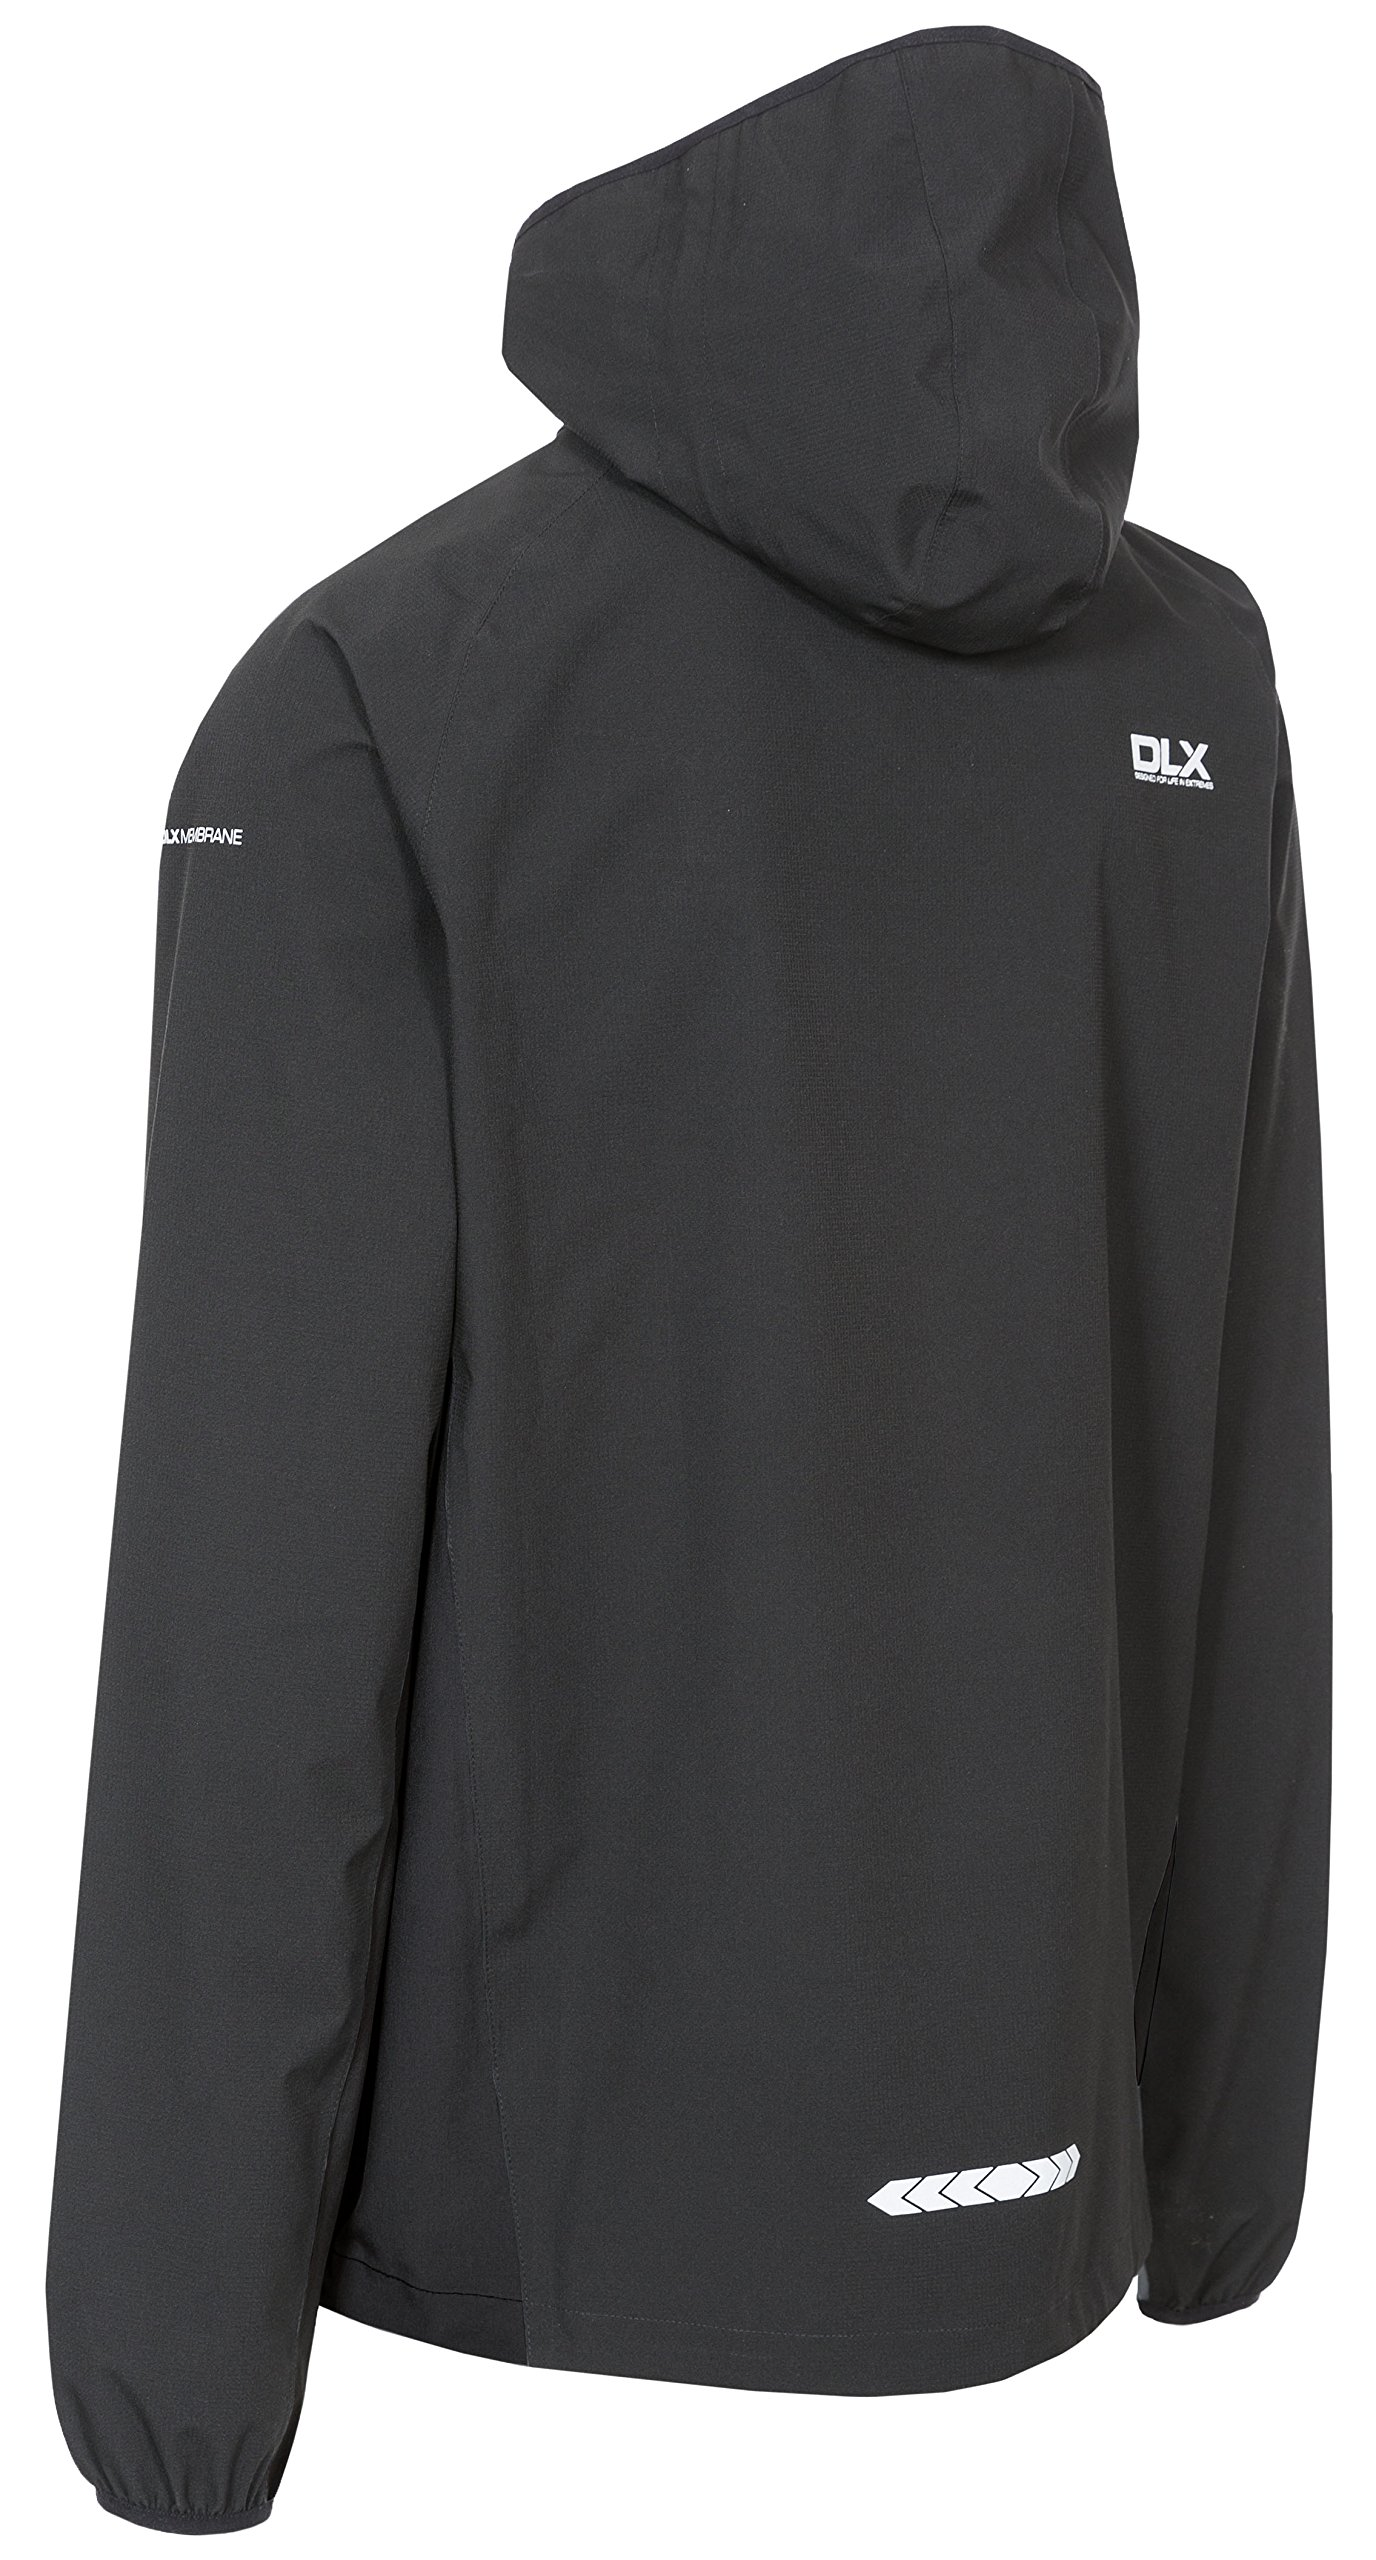 Trespass Men's Hawkings Packaway Waterproof Jacket with Removable Hood, Black, 2X-Small